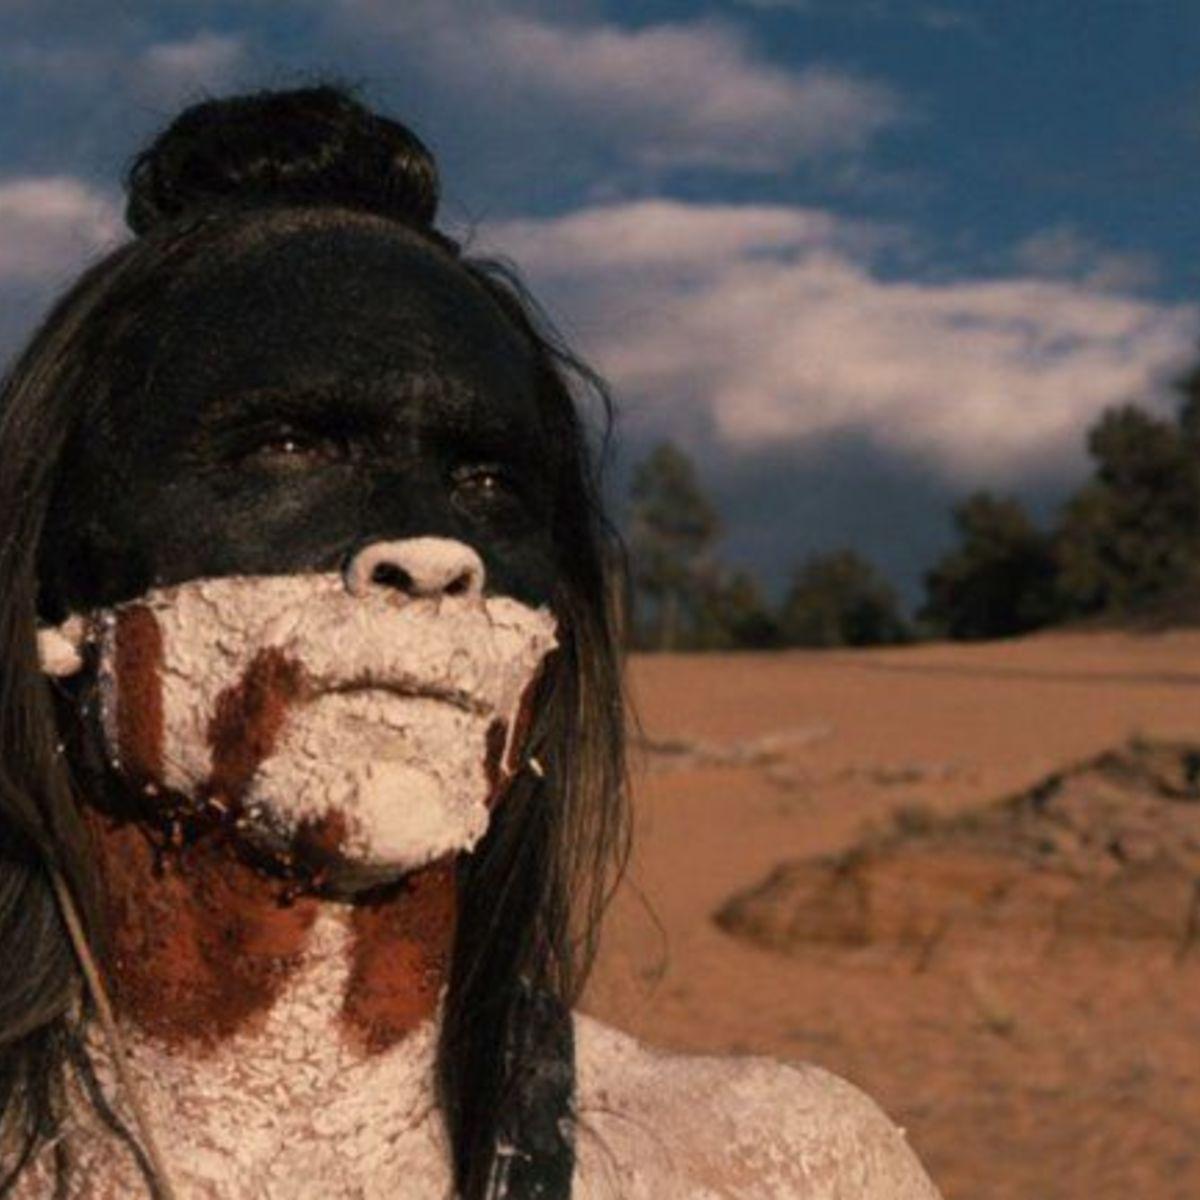 westworld s zahn mcclarnon on ghost nation and akecheta s awakening